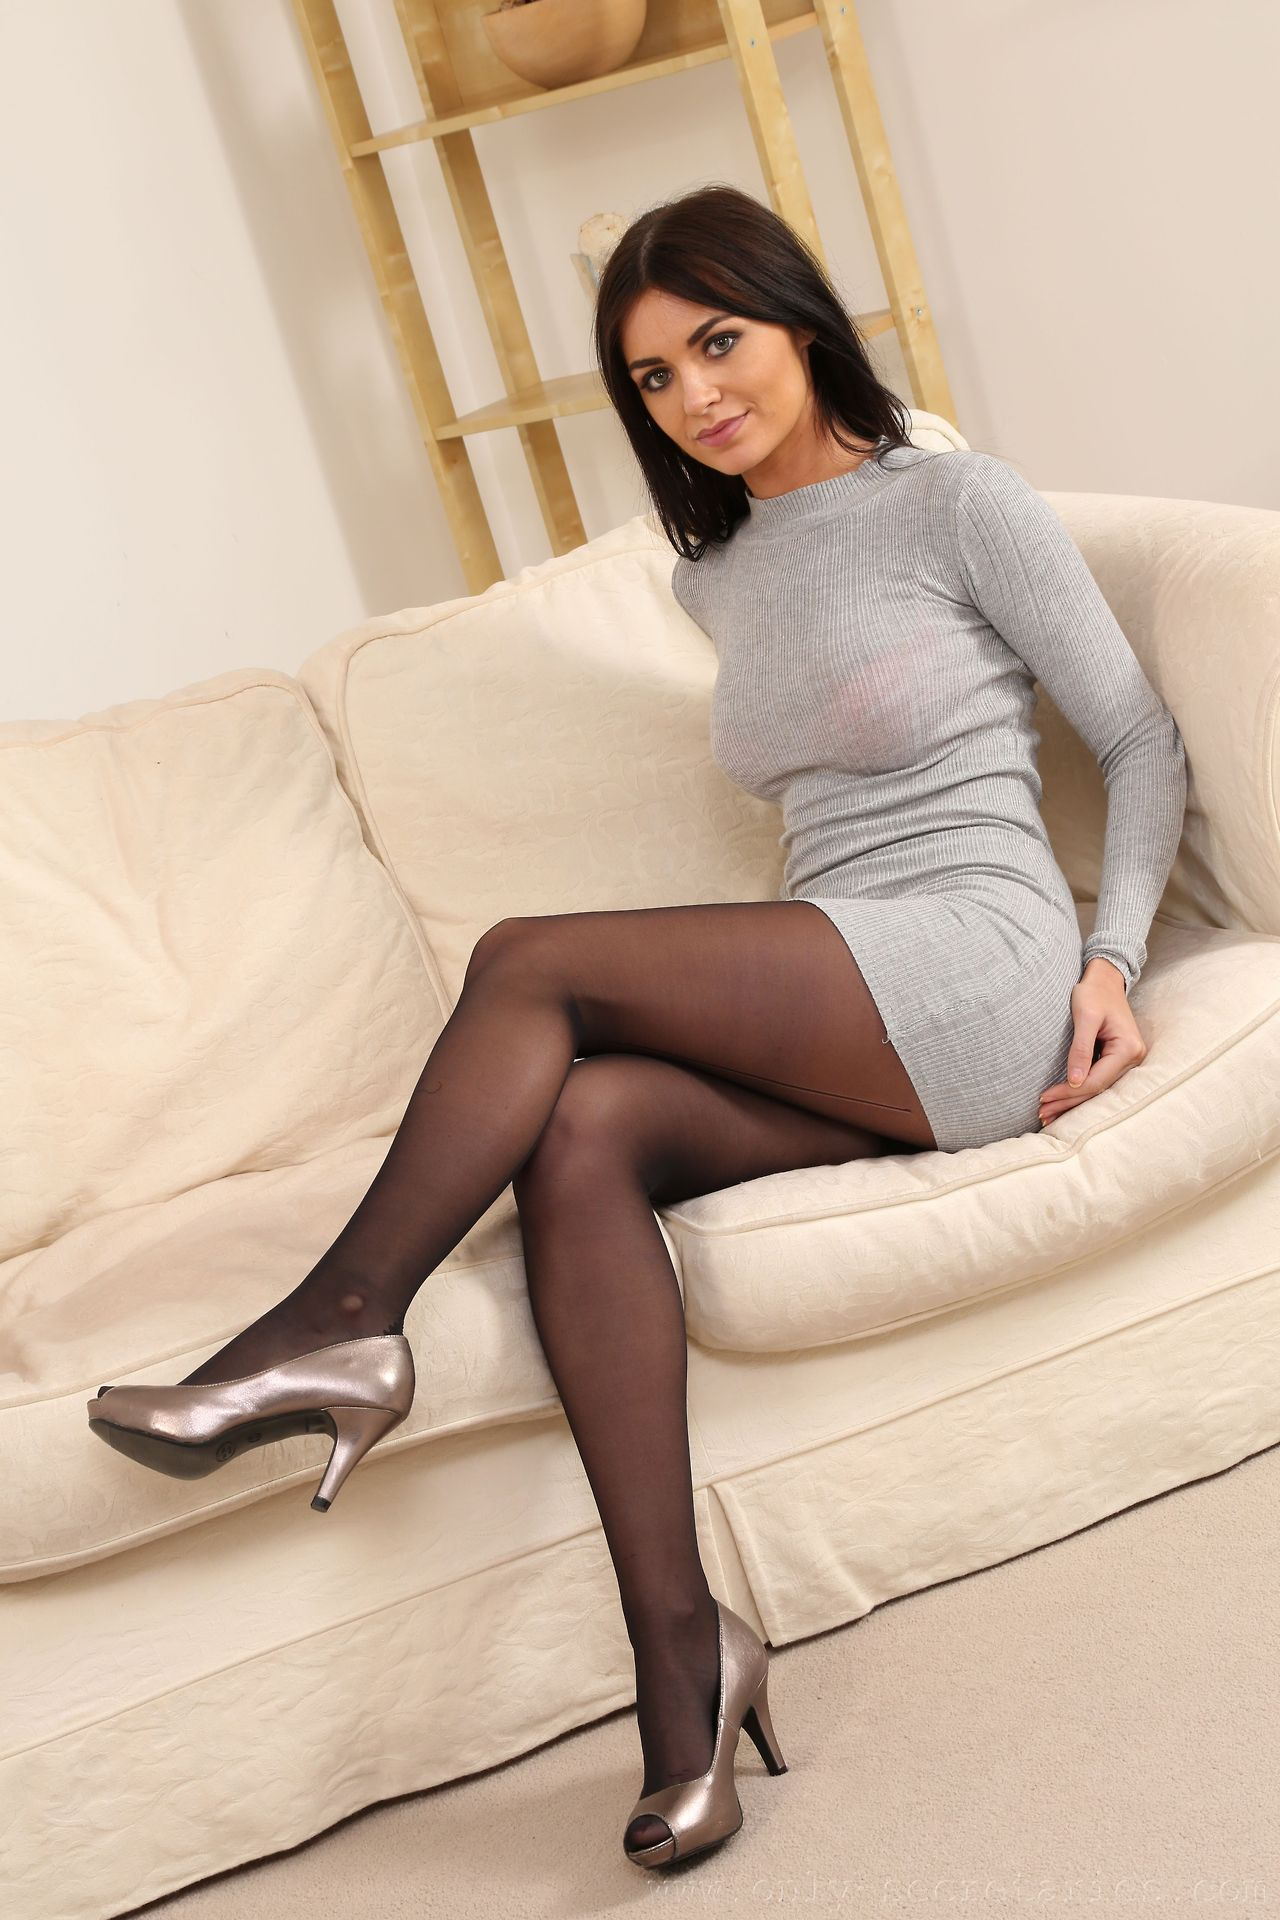 Phose1 | Pantyhose outfits, Black tights, Mini dress